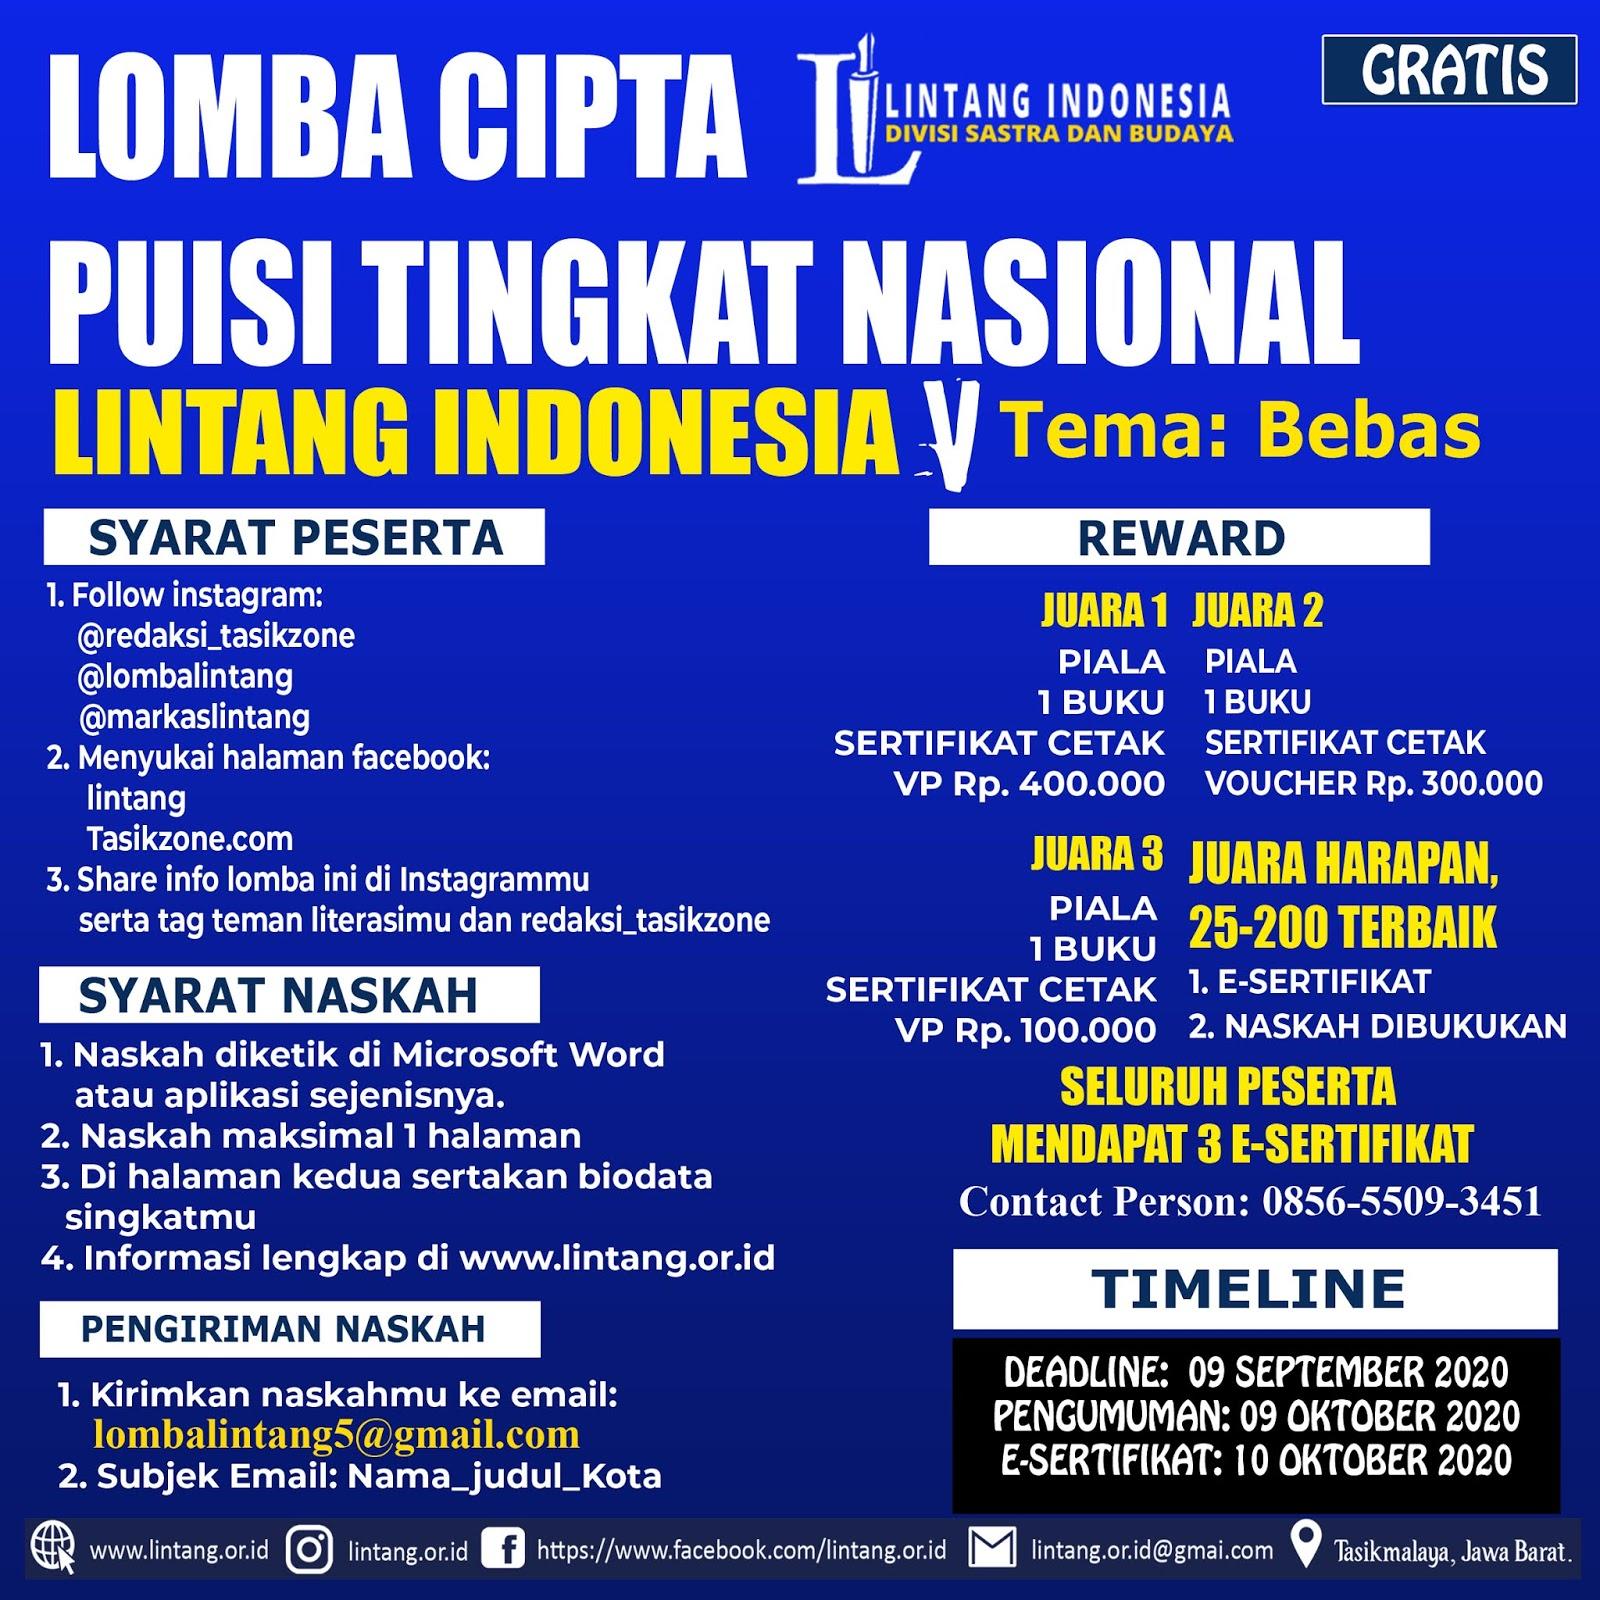 LOMBA CIPTA PUISI TINGKAT NASIONAL LINTANG INDONESIA TEMA BEBAS DEADLINE 09 SEPTEMBER 2020 PART V